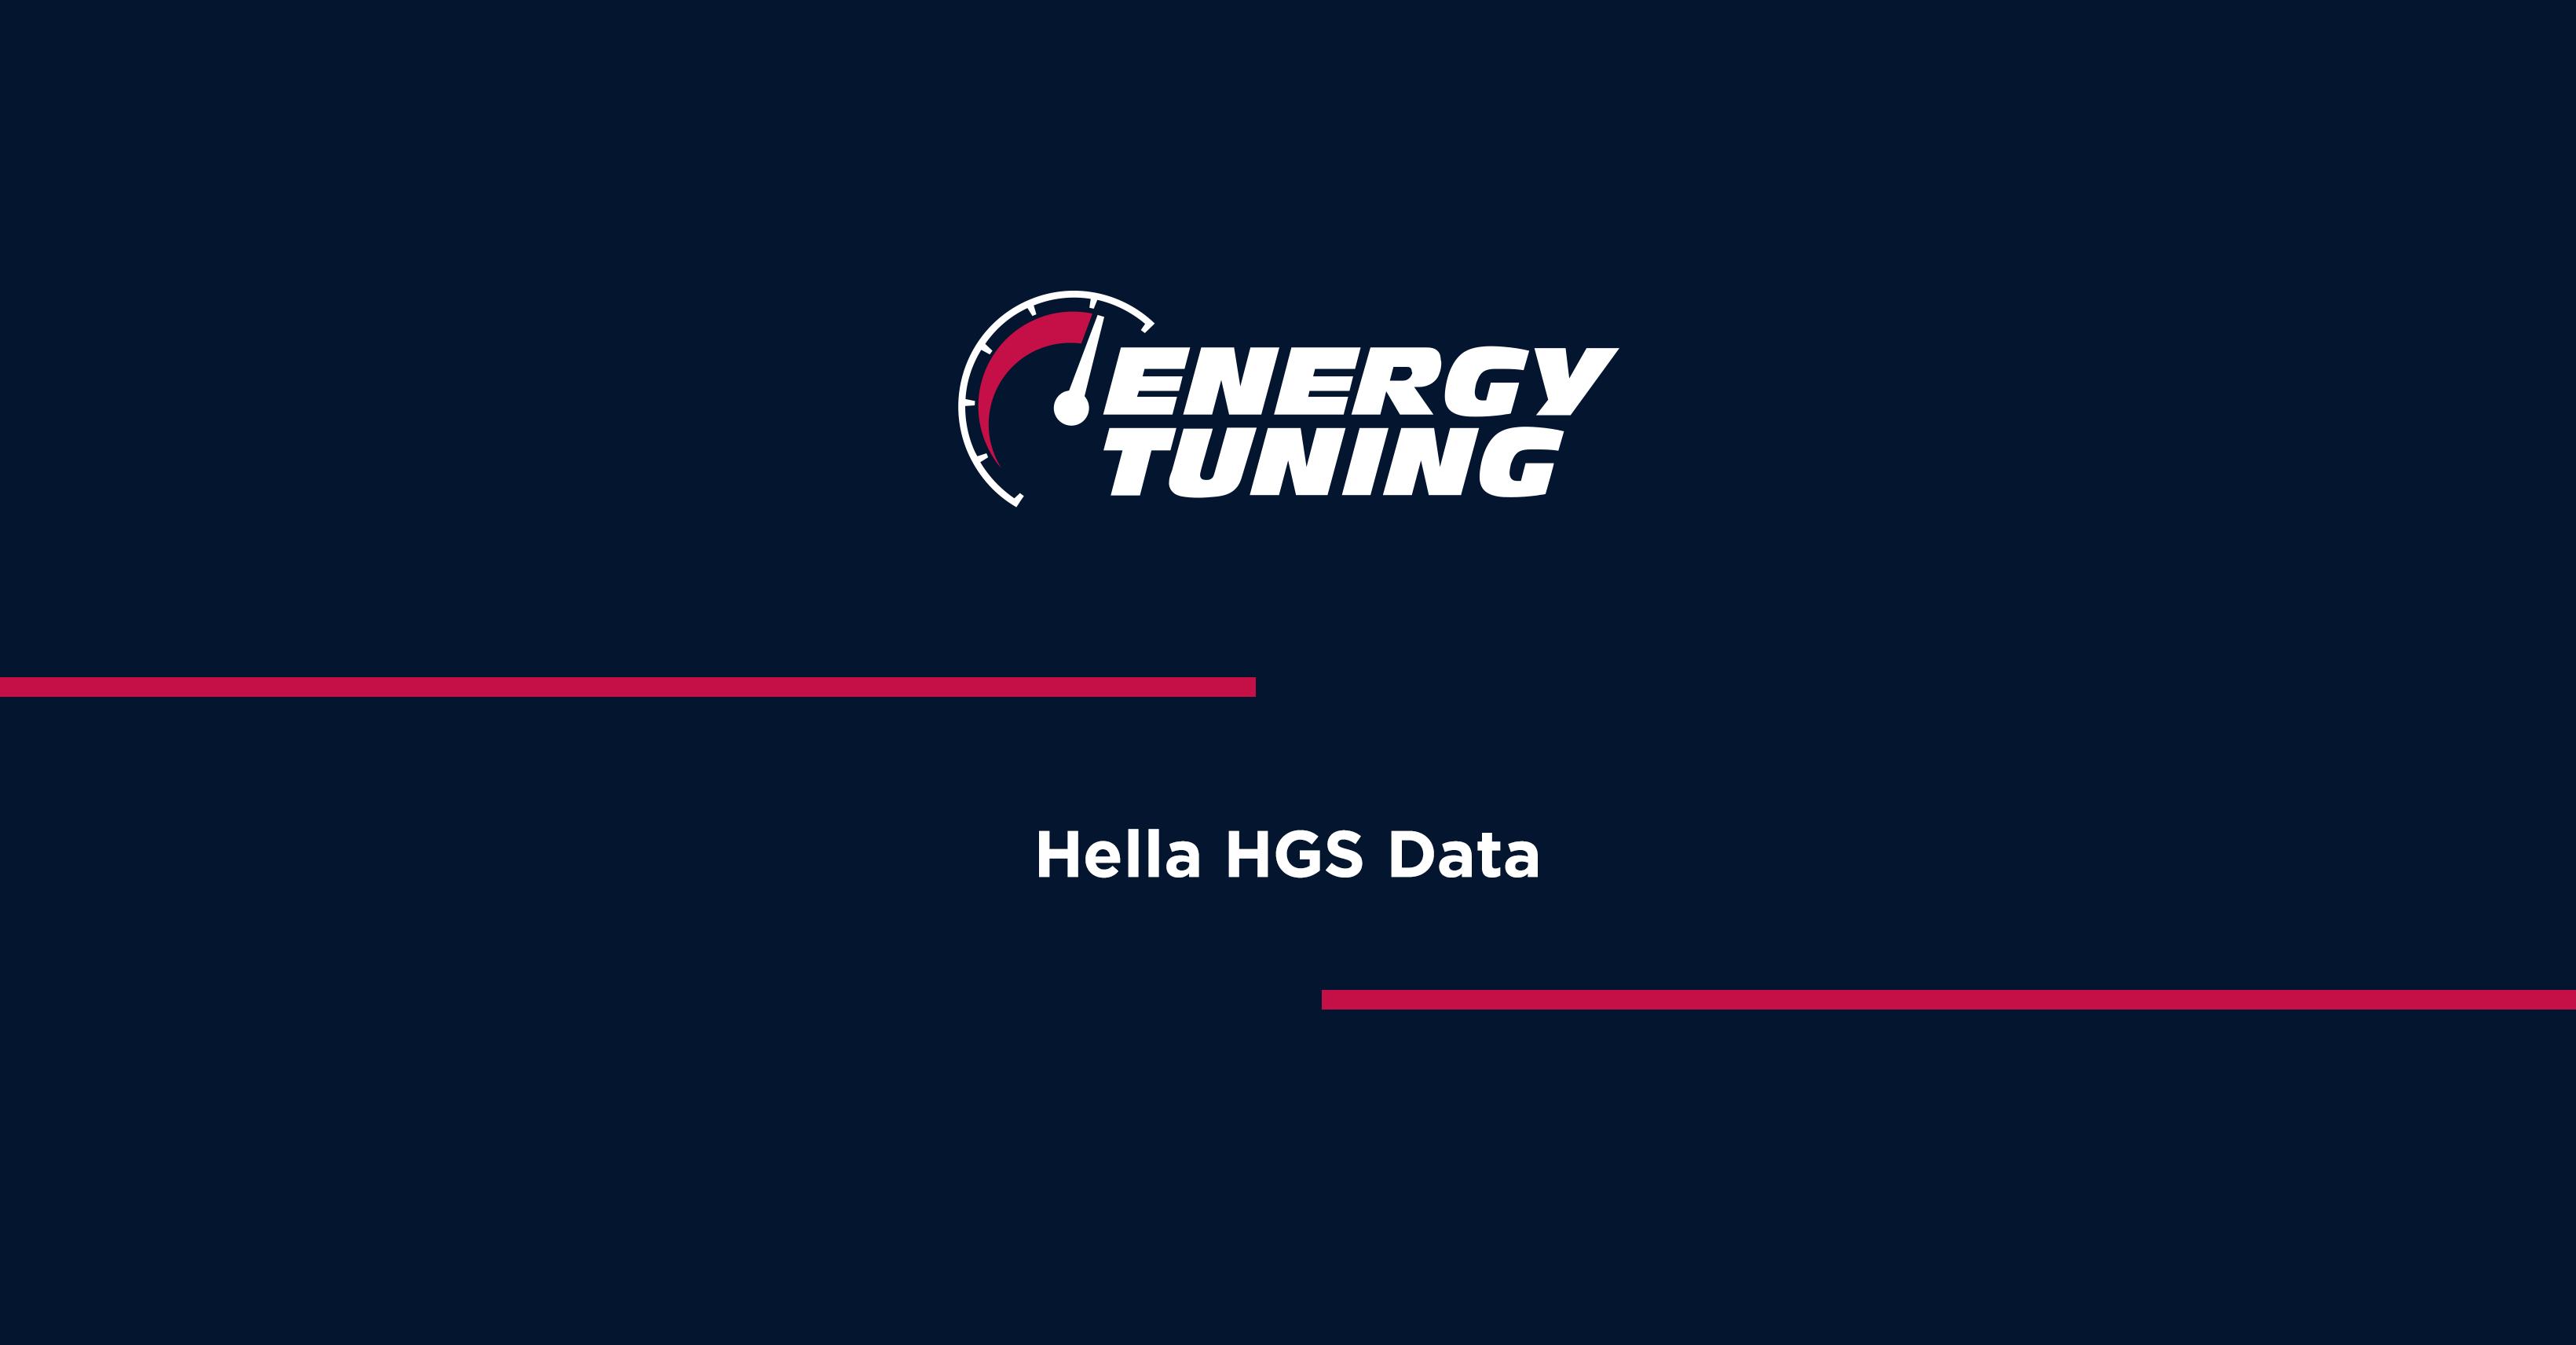 Hella HGS Data Order Online